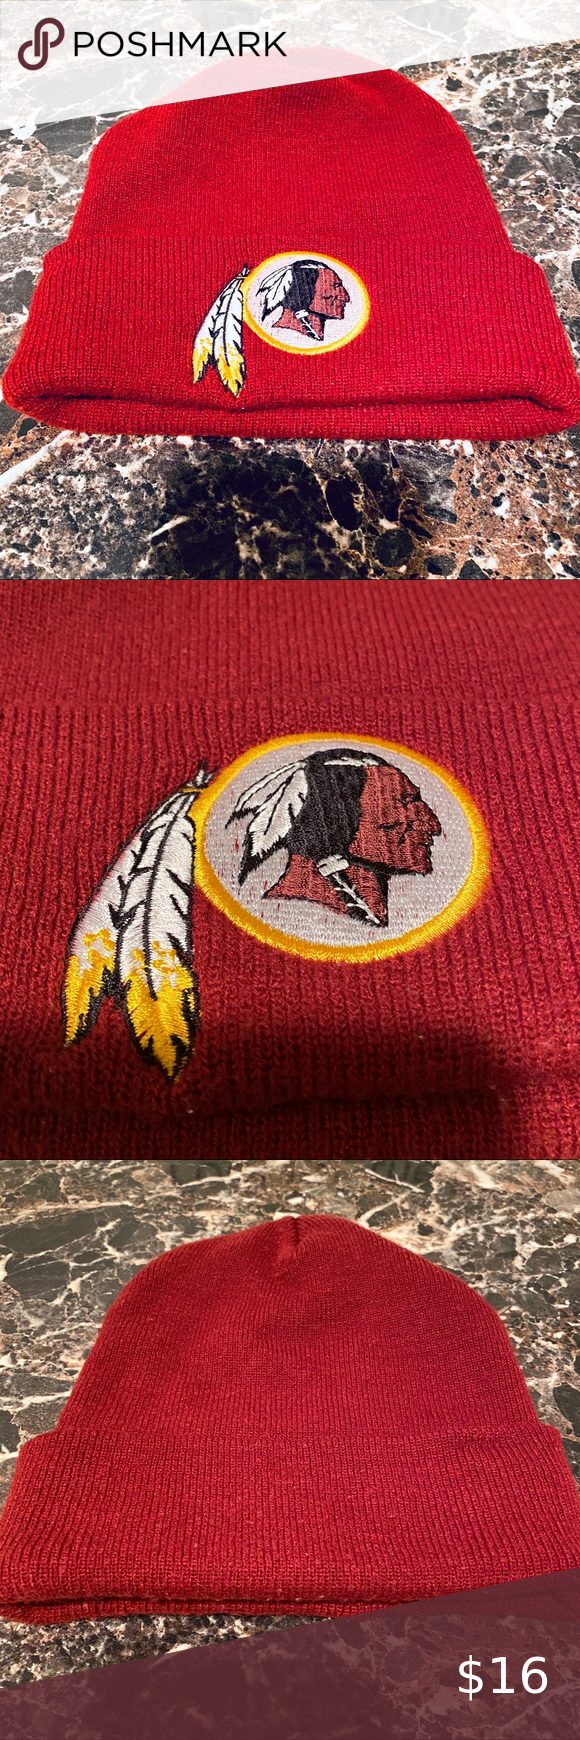 REDSKINS NFL Windbreaker Jacket in 2020 (With images